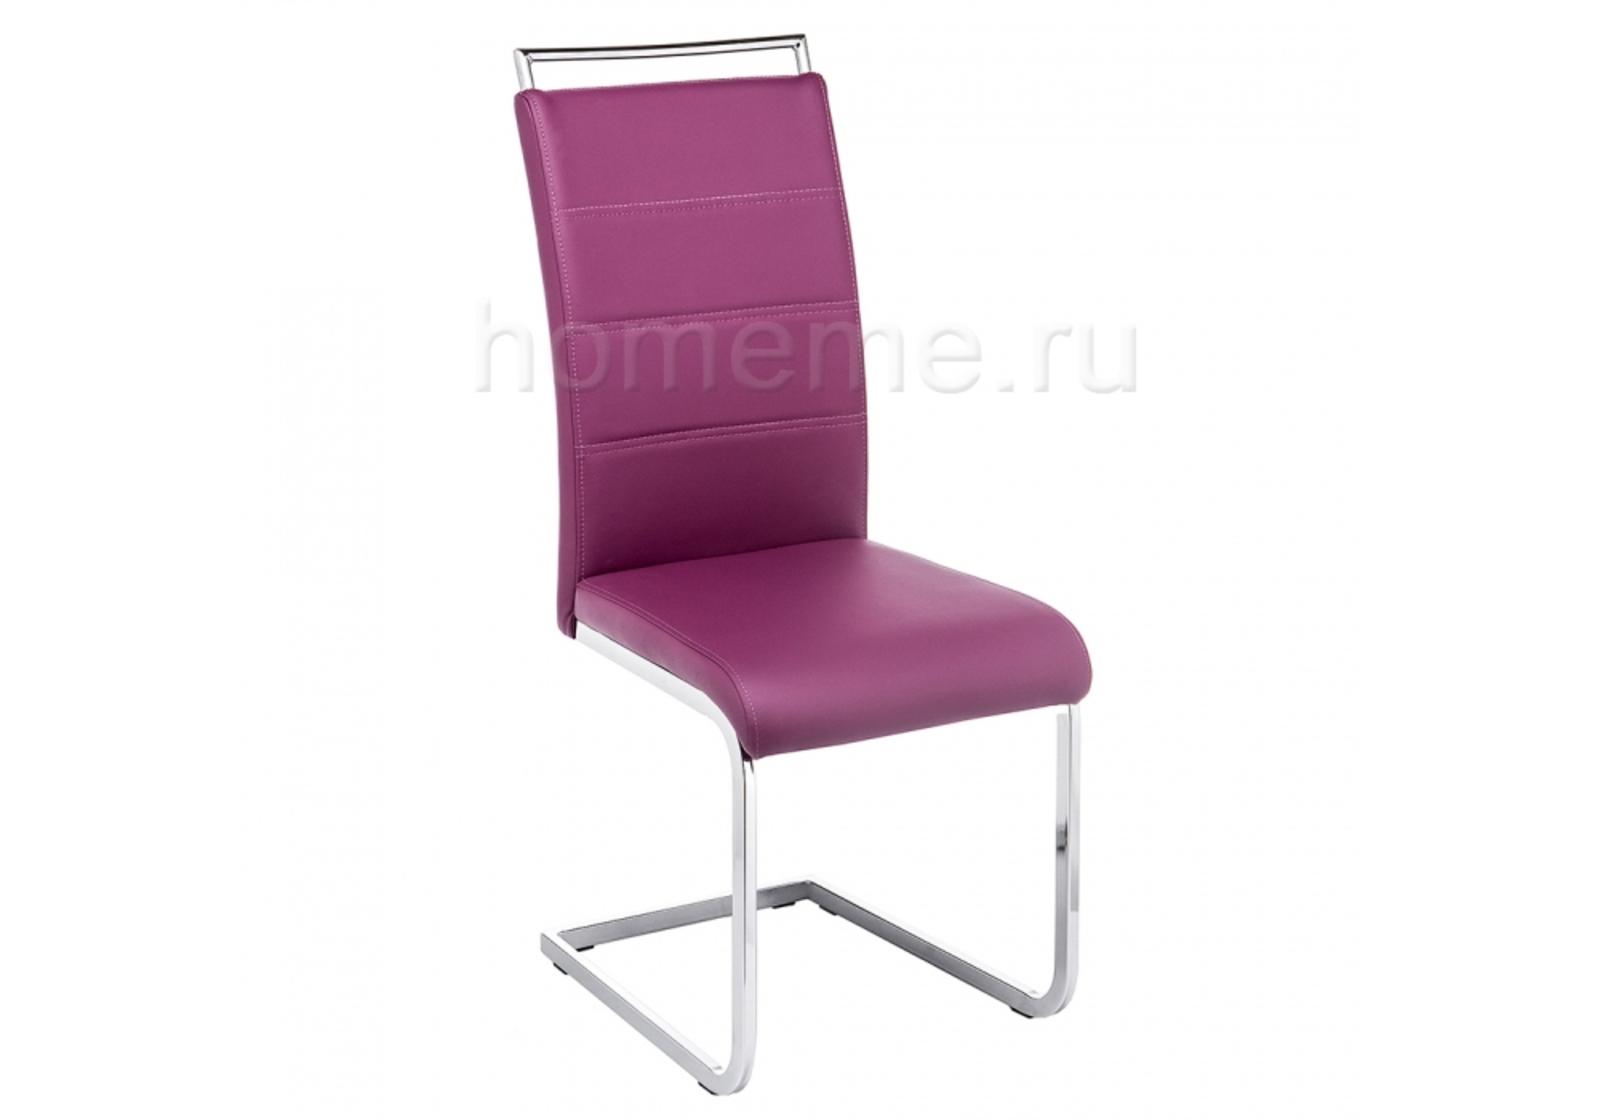 Стул HomeMe Oddy фиолетовый 11150 от Homeme.ru